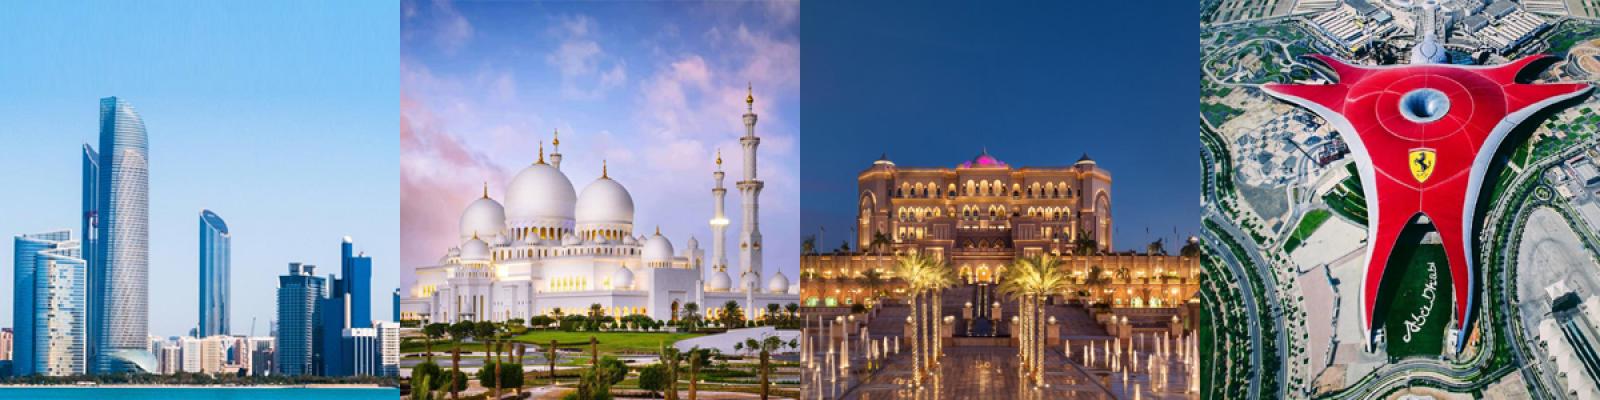 abu dhabi city tour with ferrari world, abu dhabi sightseeing tour with ferrari world, abu dhabi ferrari world package, abu Dhabi Ferrari world tour